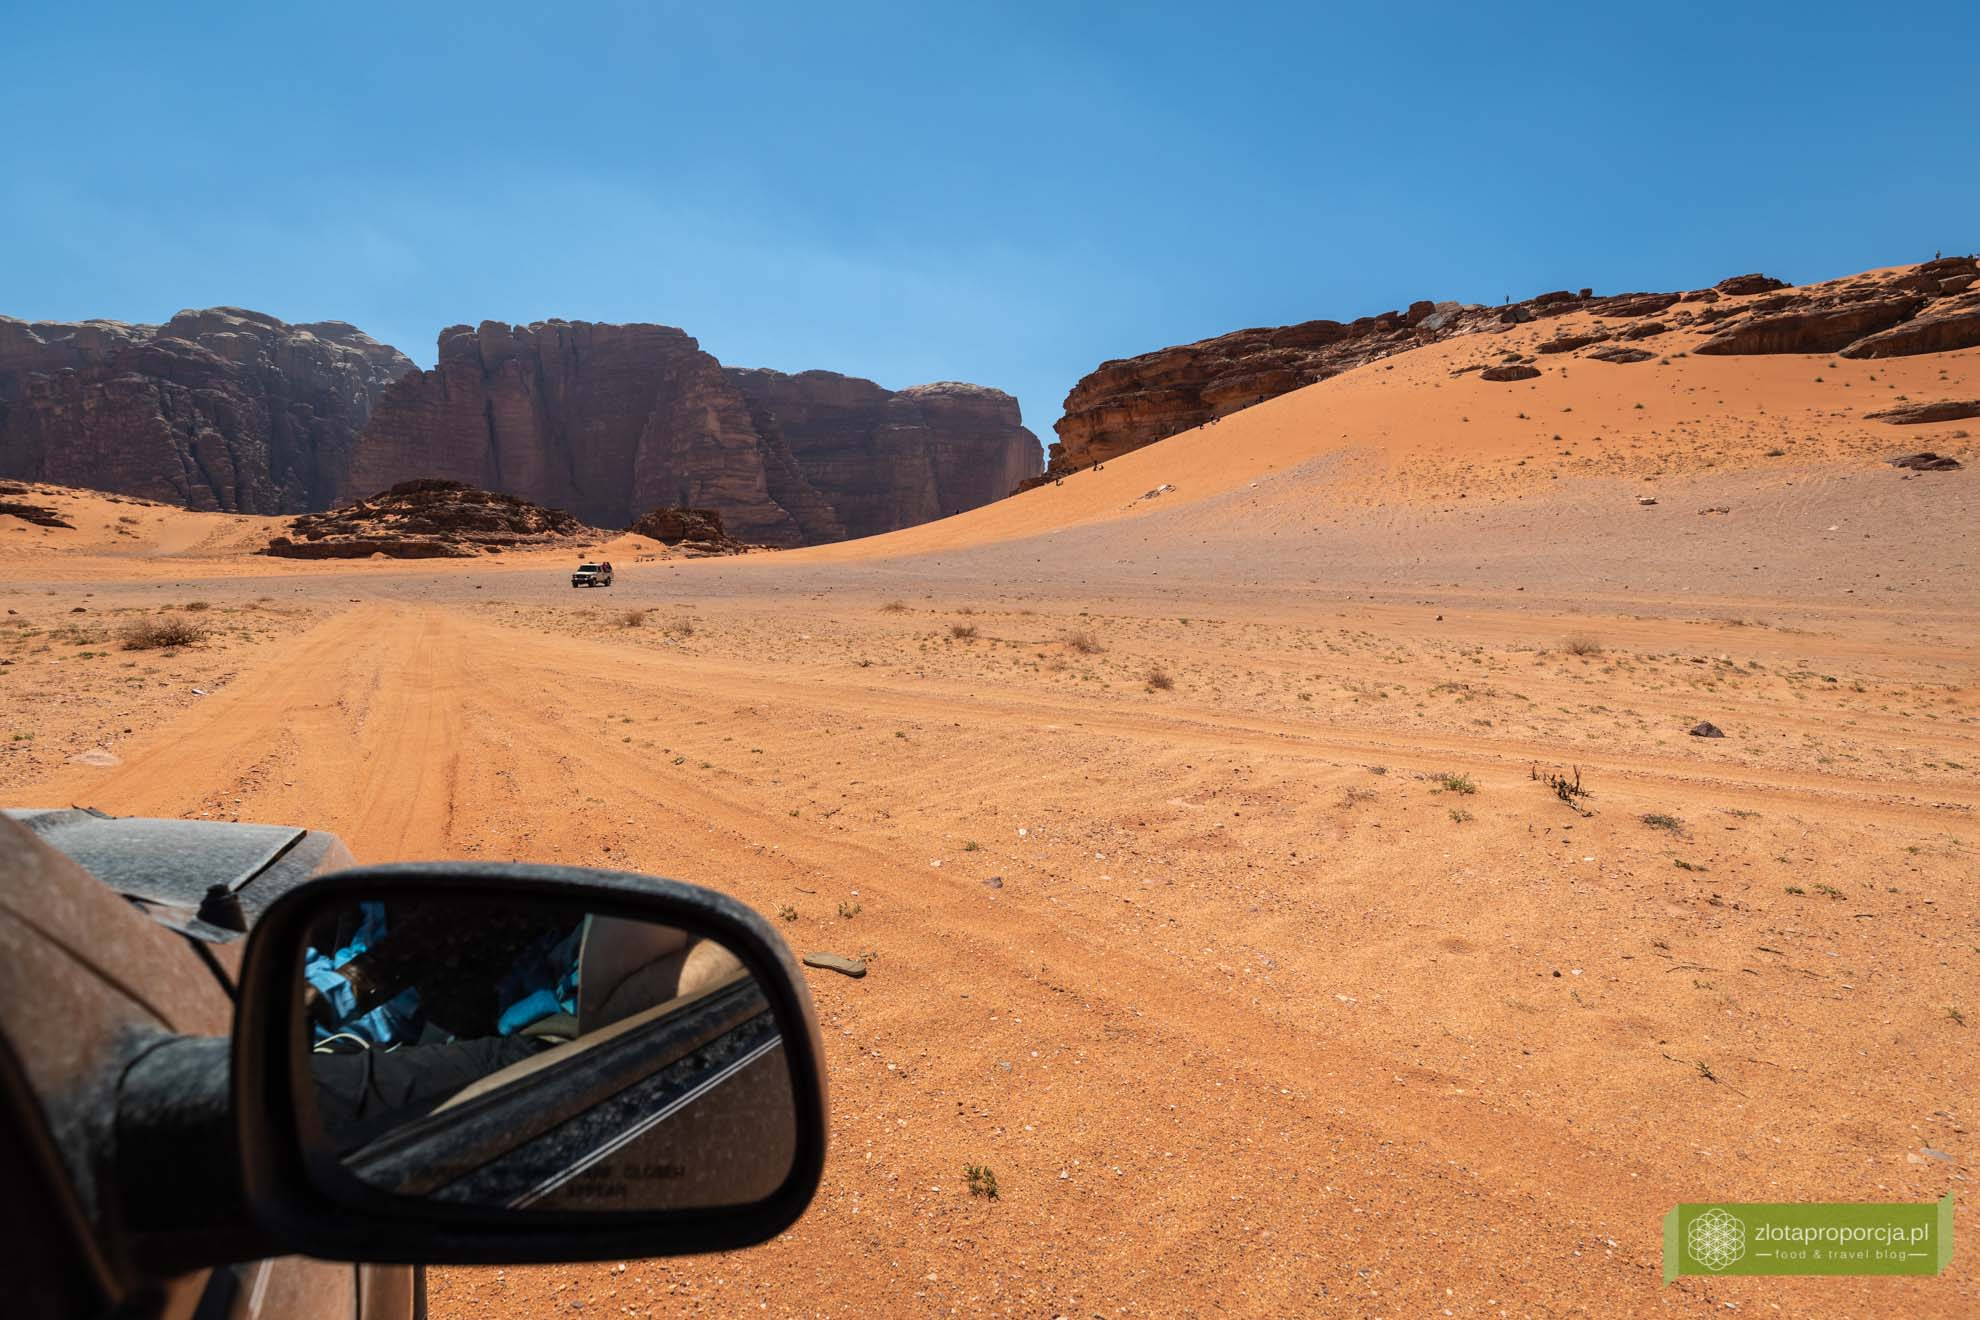 Wadi Rum, pustynia Wadi Rum, Jordania, pustynia Jordania; Wadi rum wycieczka, Wadi Rum zwiedzanie, Jordania atrakcje;